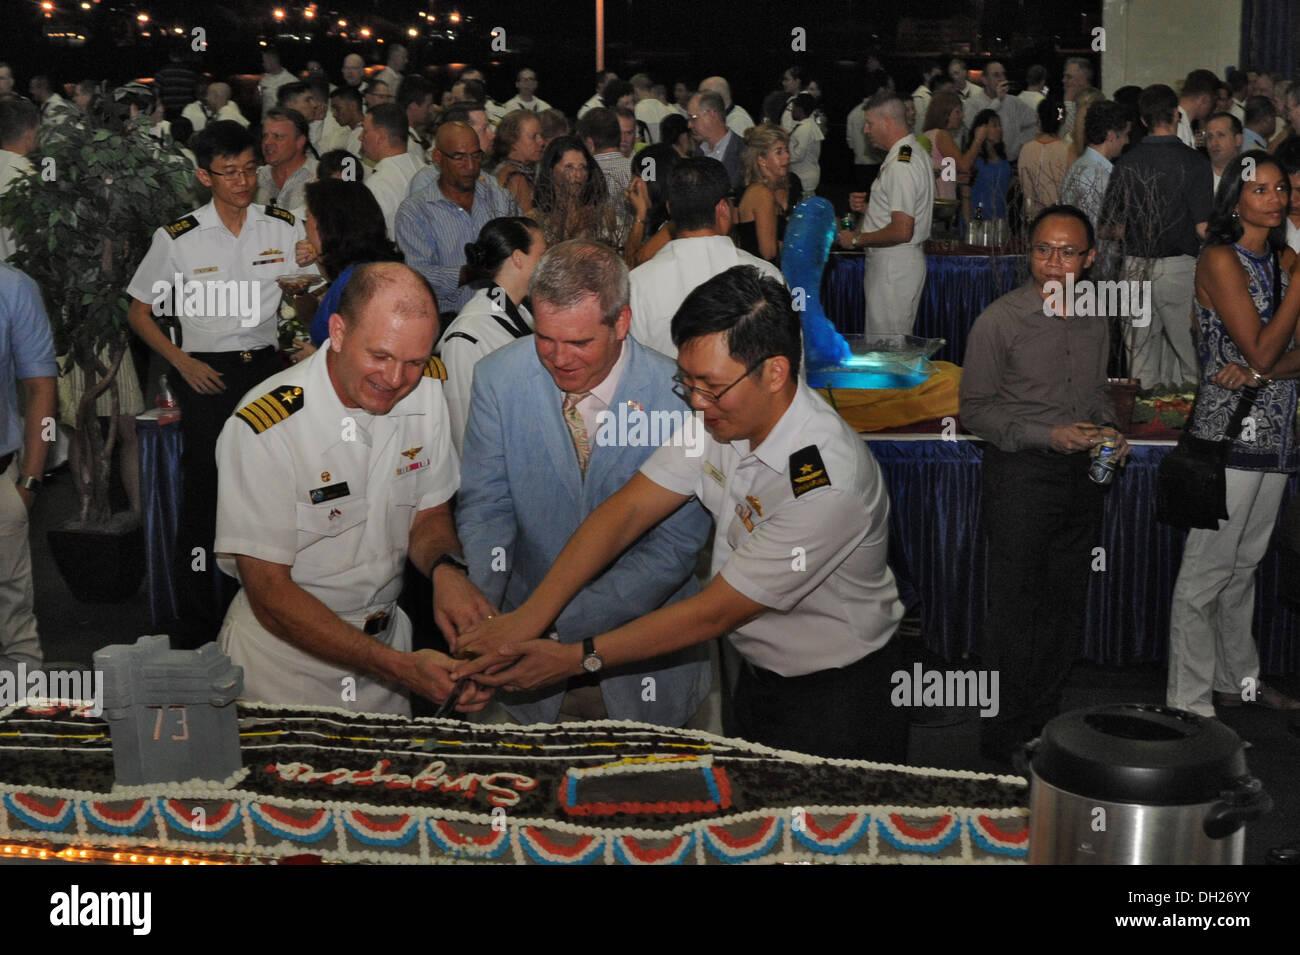 SINGAPORE (Oct. 26, 2013) Capt. Greg Fenton, left, commanding officer of the aircraft carrier USS George Washington (CVN 73), c - Stock Image